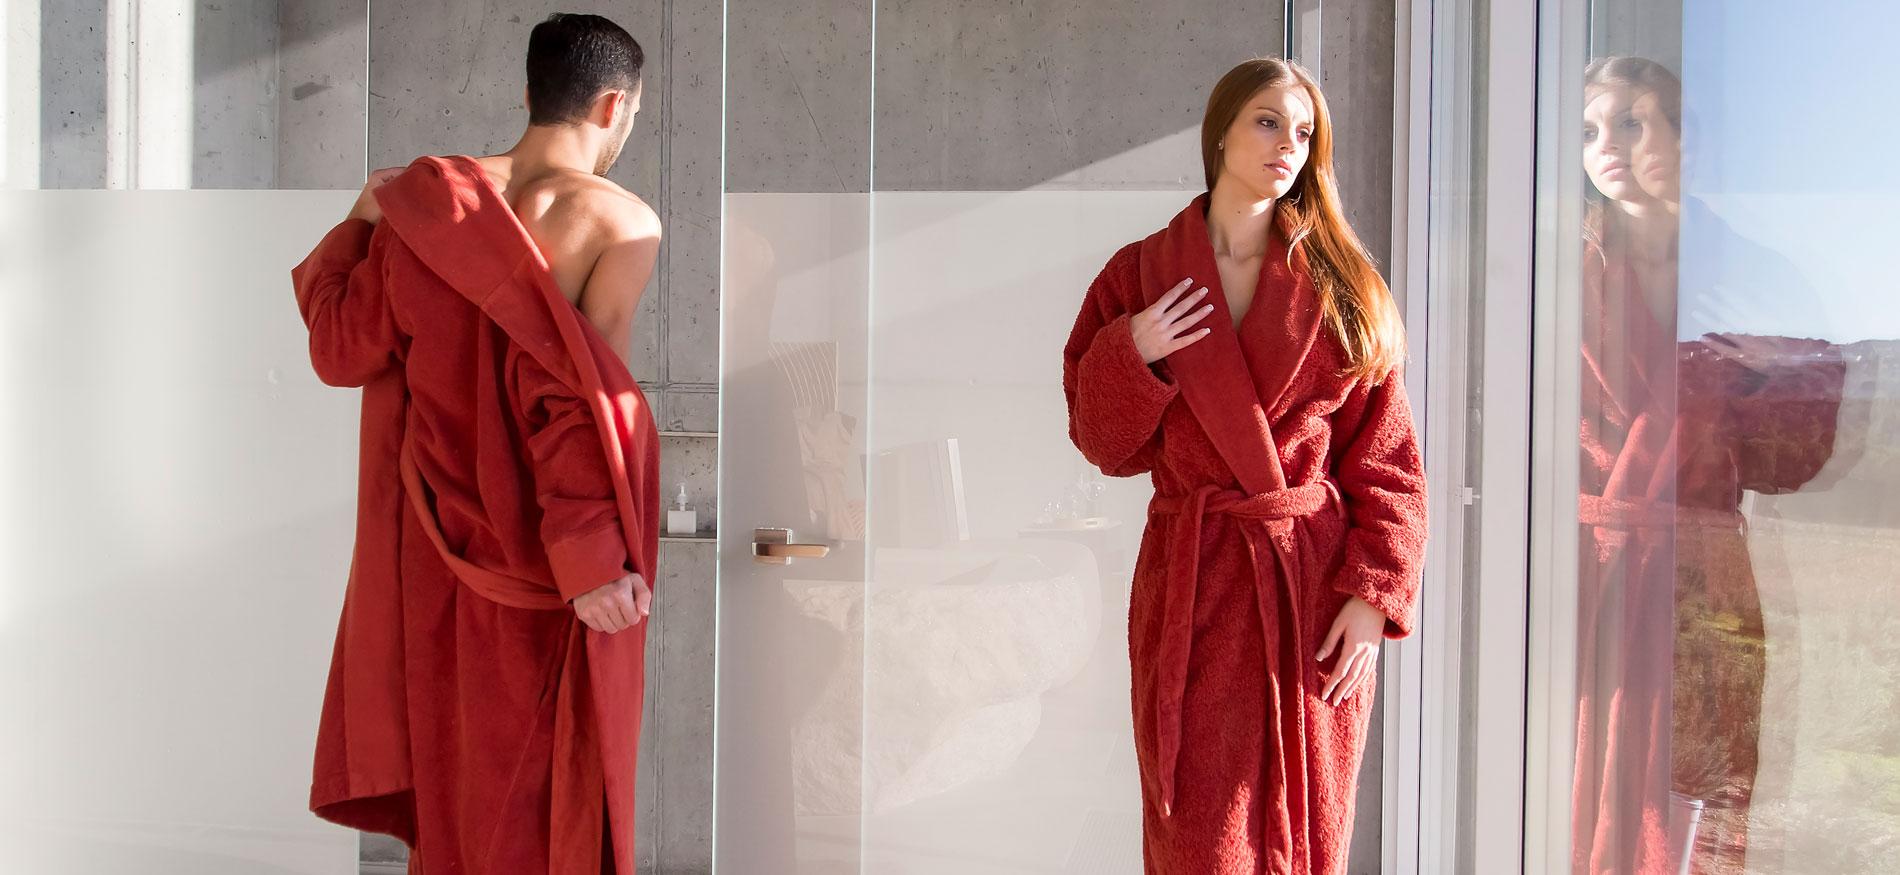 Bathrobes & Dressing Gowns